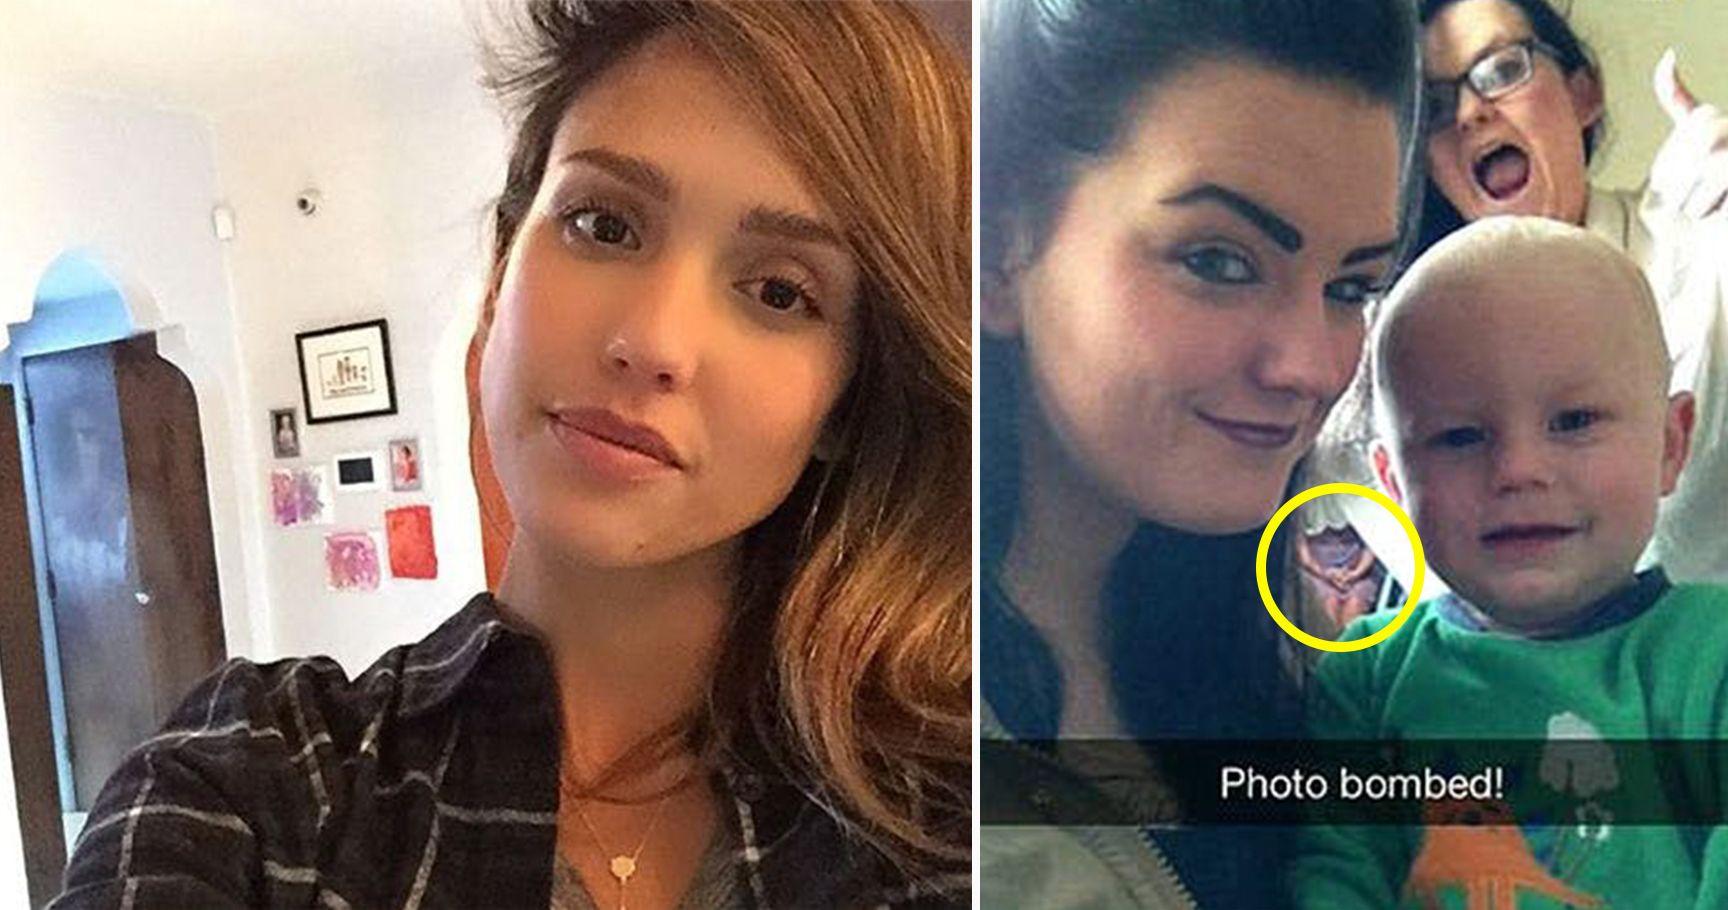 15 Selfies That Revealed Something Terrifyingly Sinister